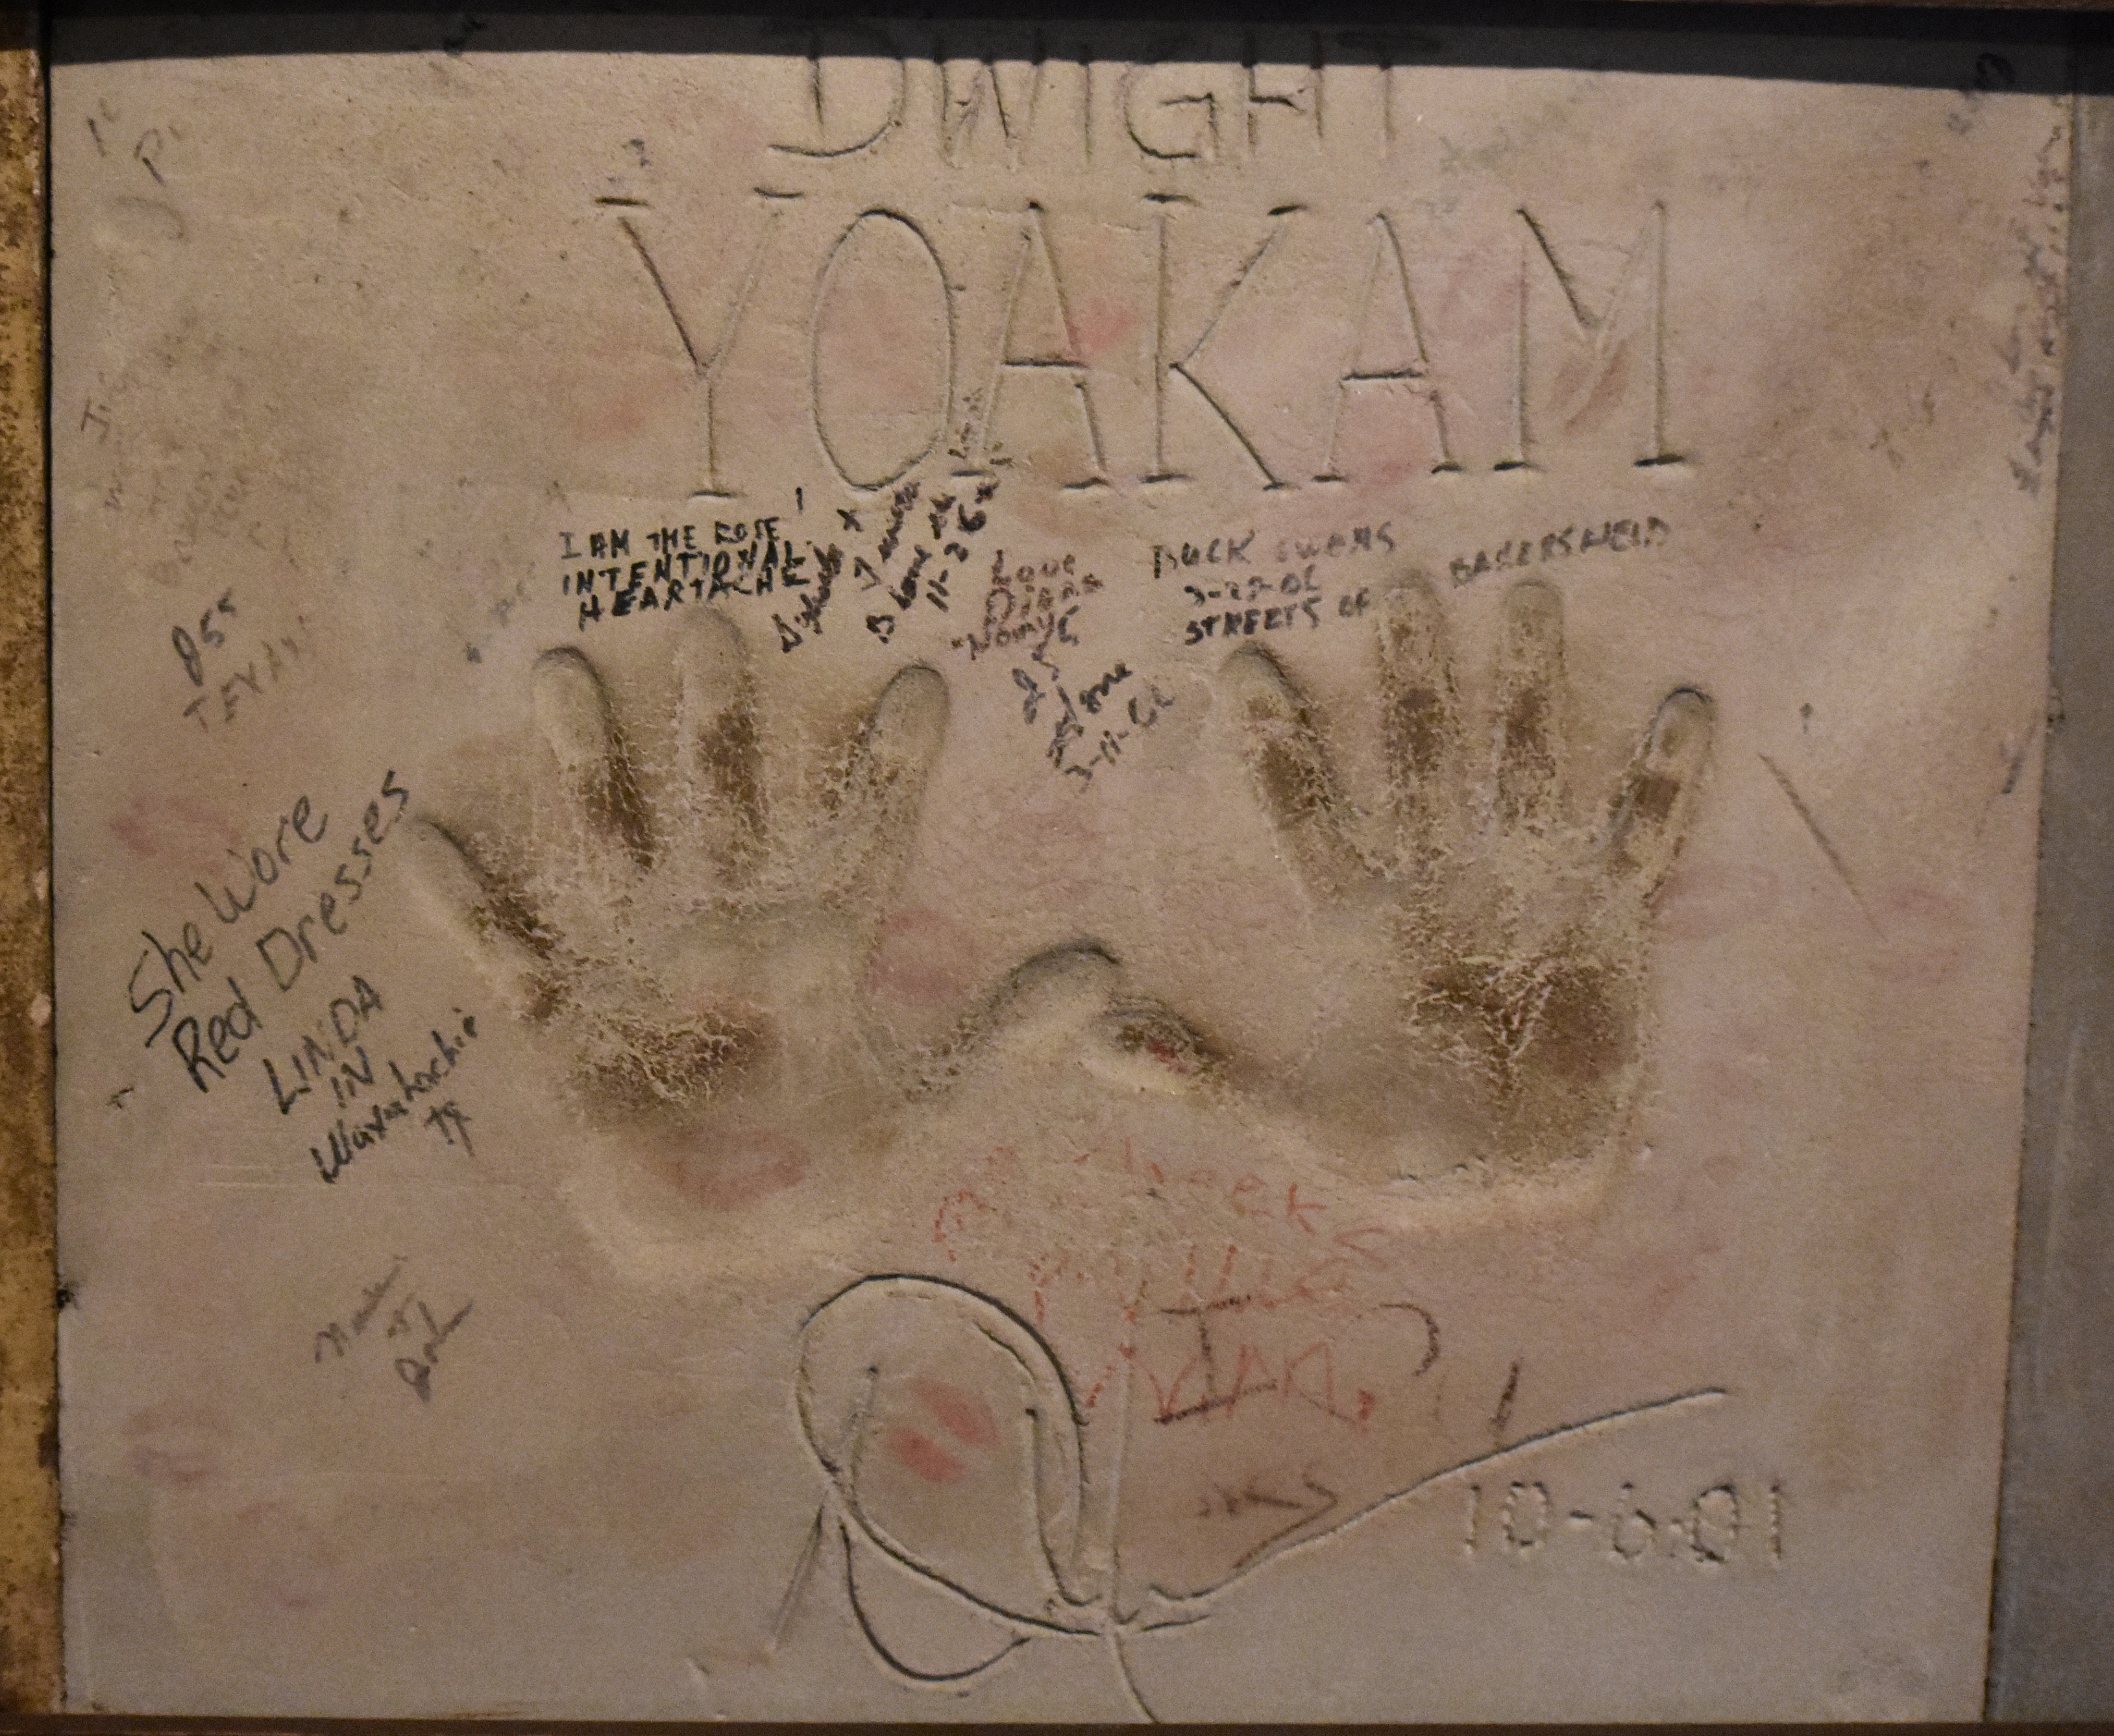 Dwight Yoakam - Feb 14